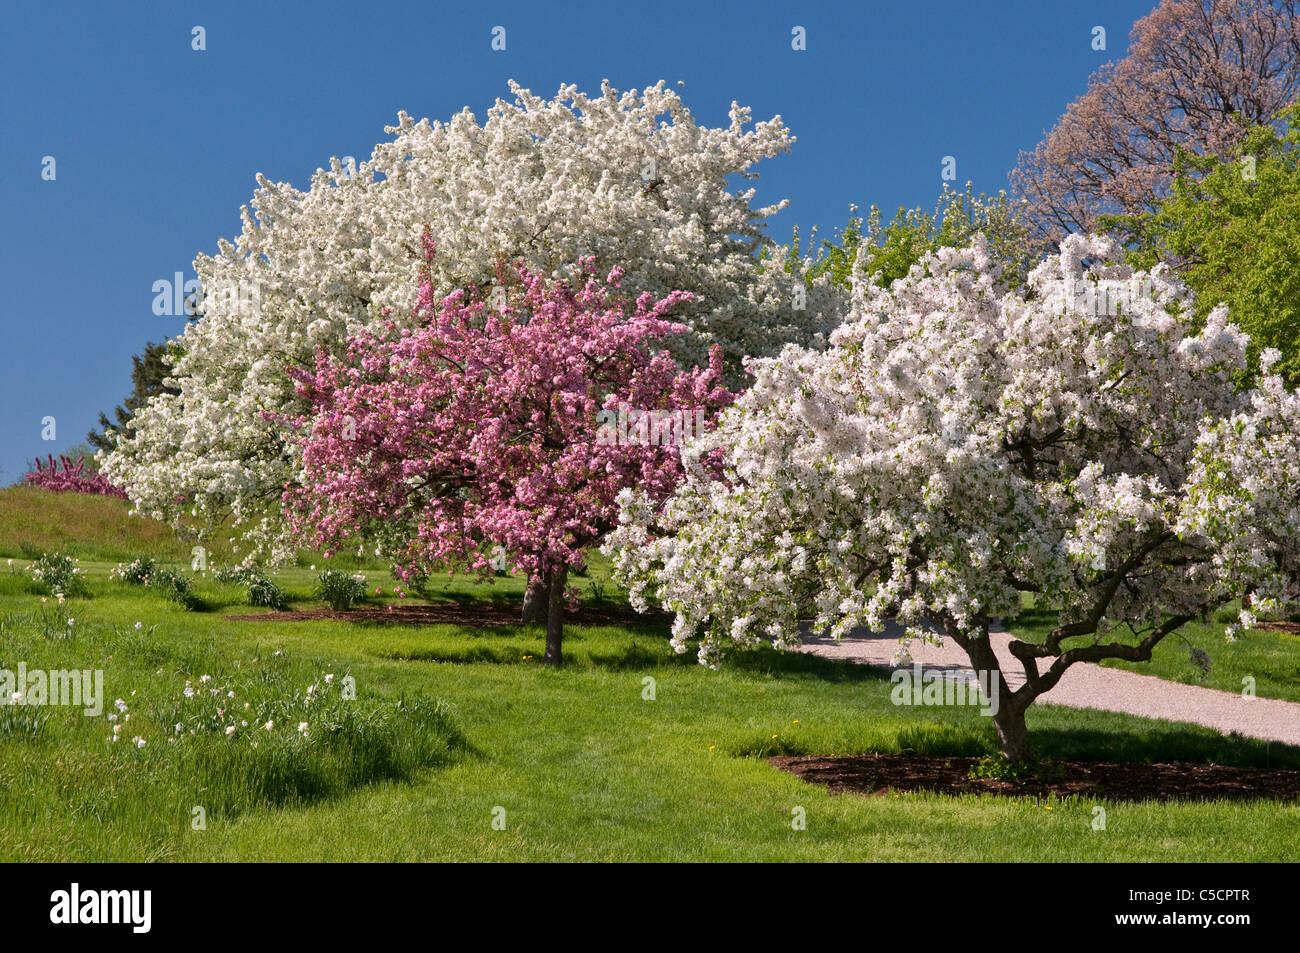 Flowering Crabapple Trees Stock Photos Flowering Crabapple Trees